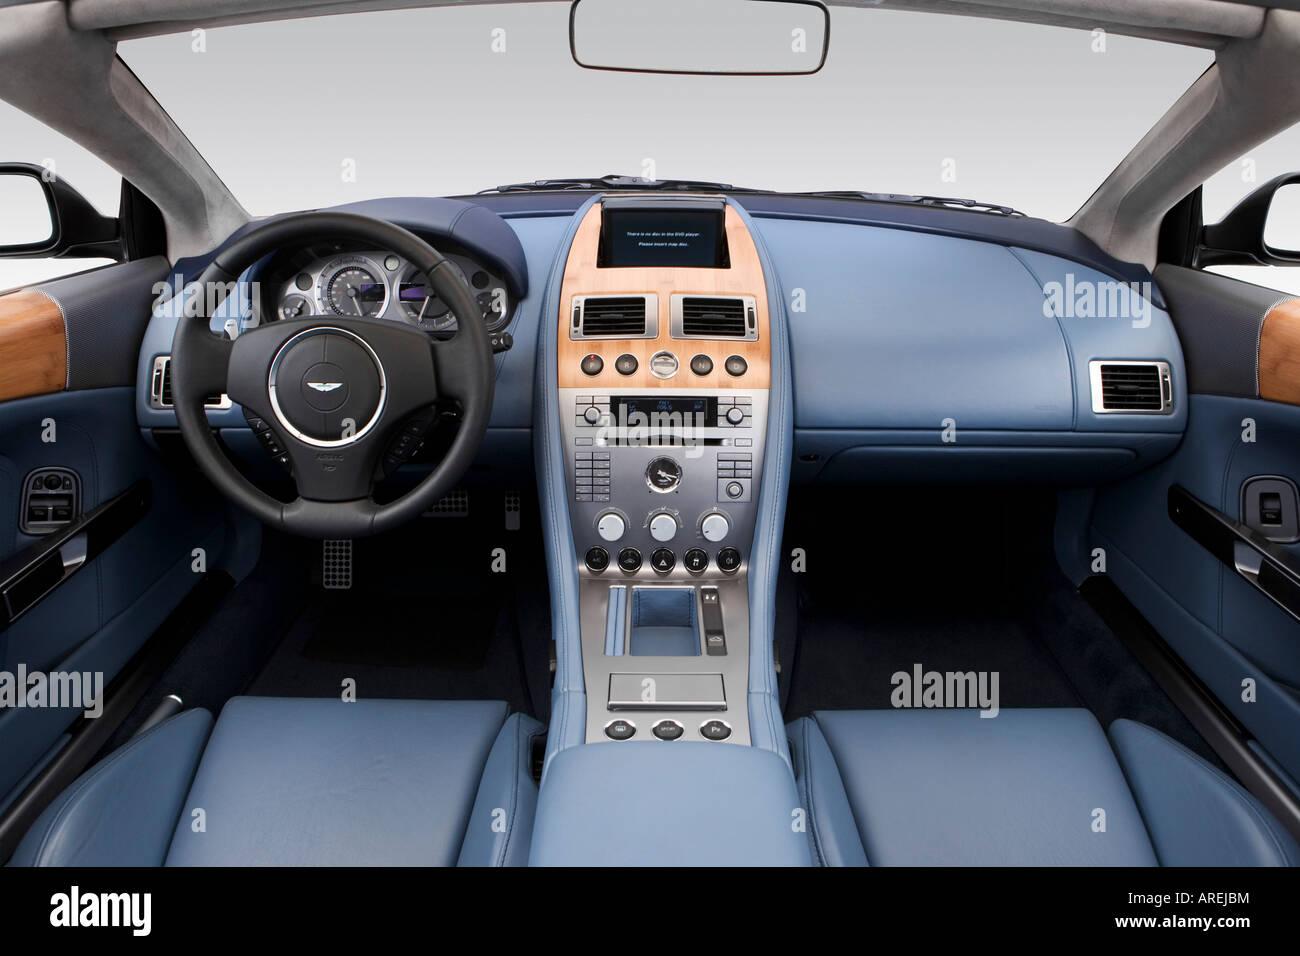 Aston Martin Db Dashboard Stock Photos Aston Martin Db Dashboard - 2006 aston martin db9